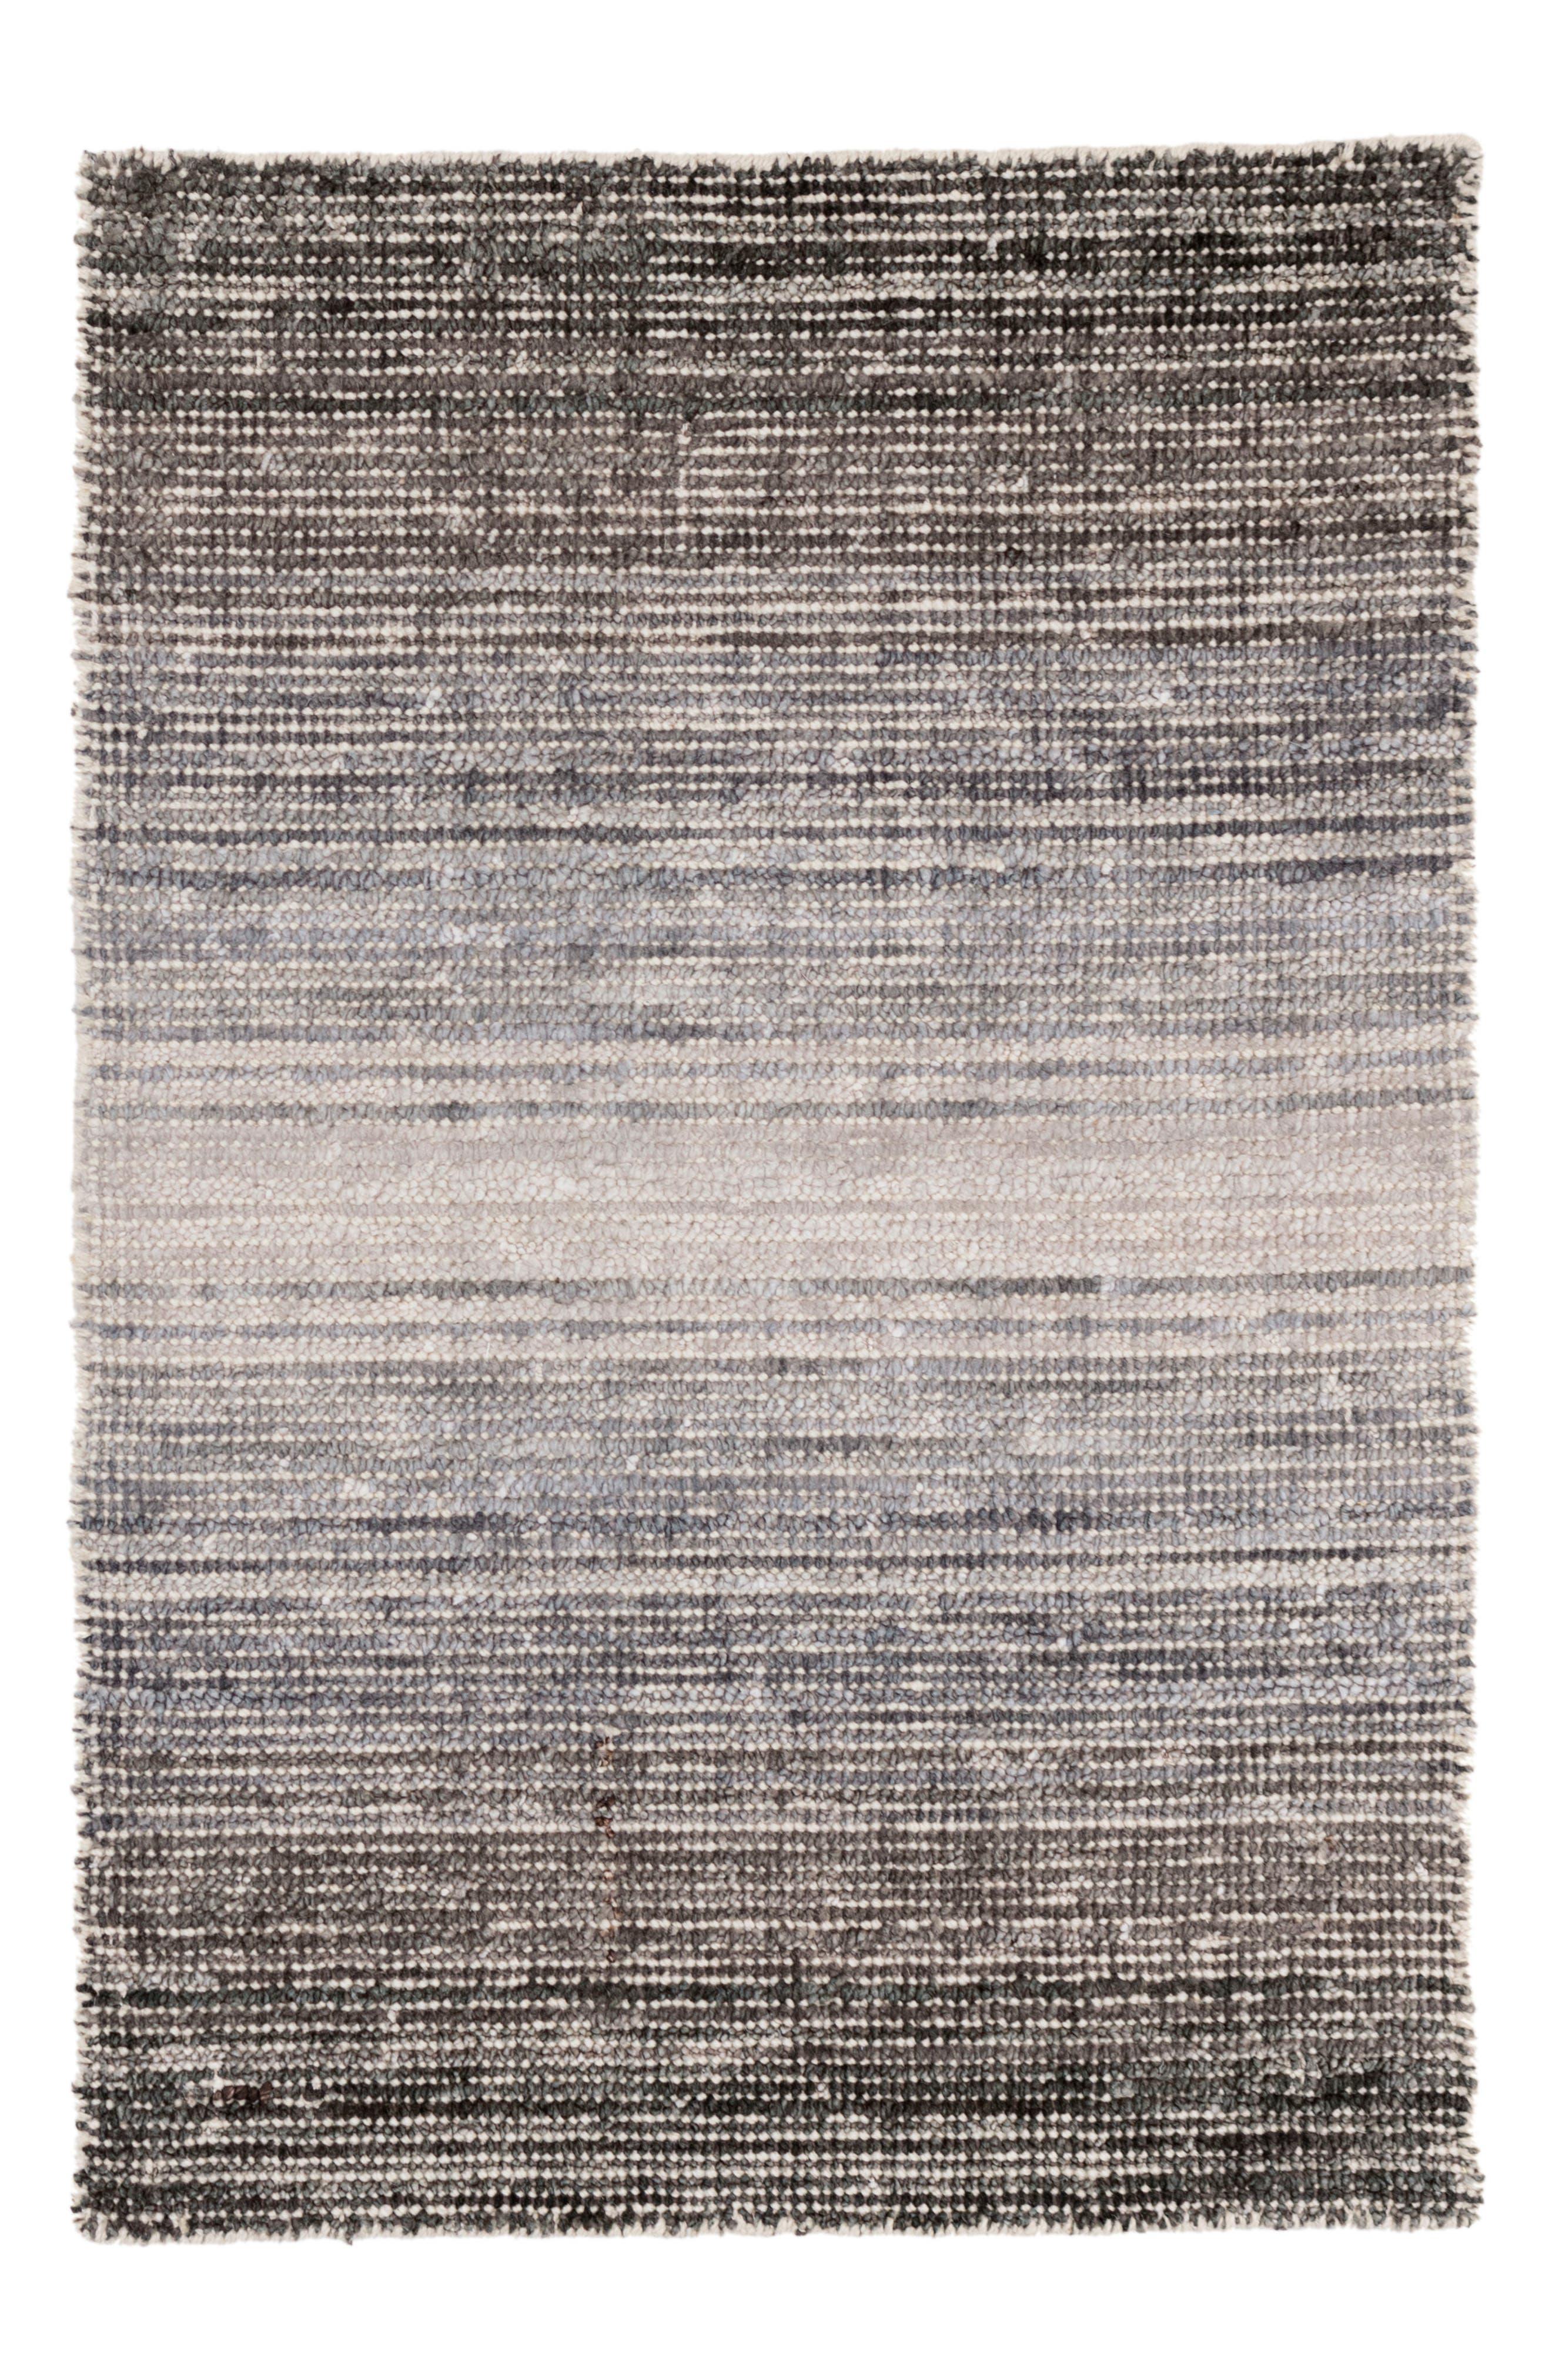 Grey Moon Handwoven Rug,                             Main thumbnail 1, color,                             020